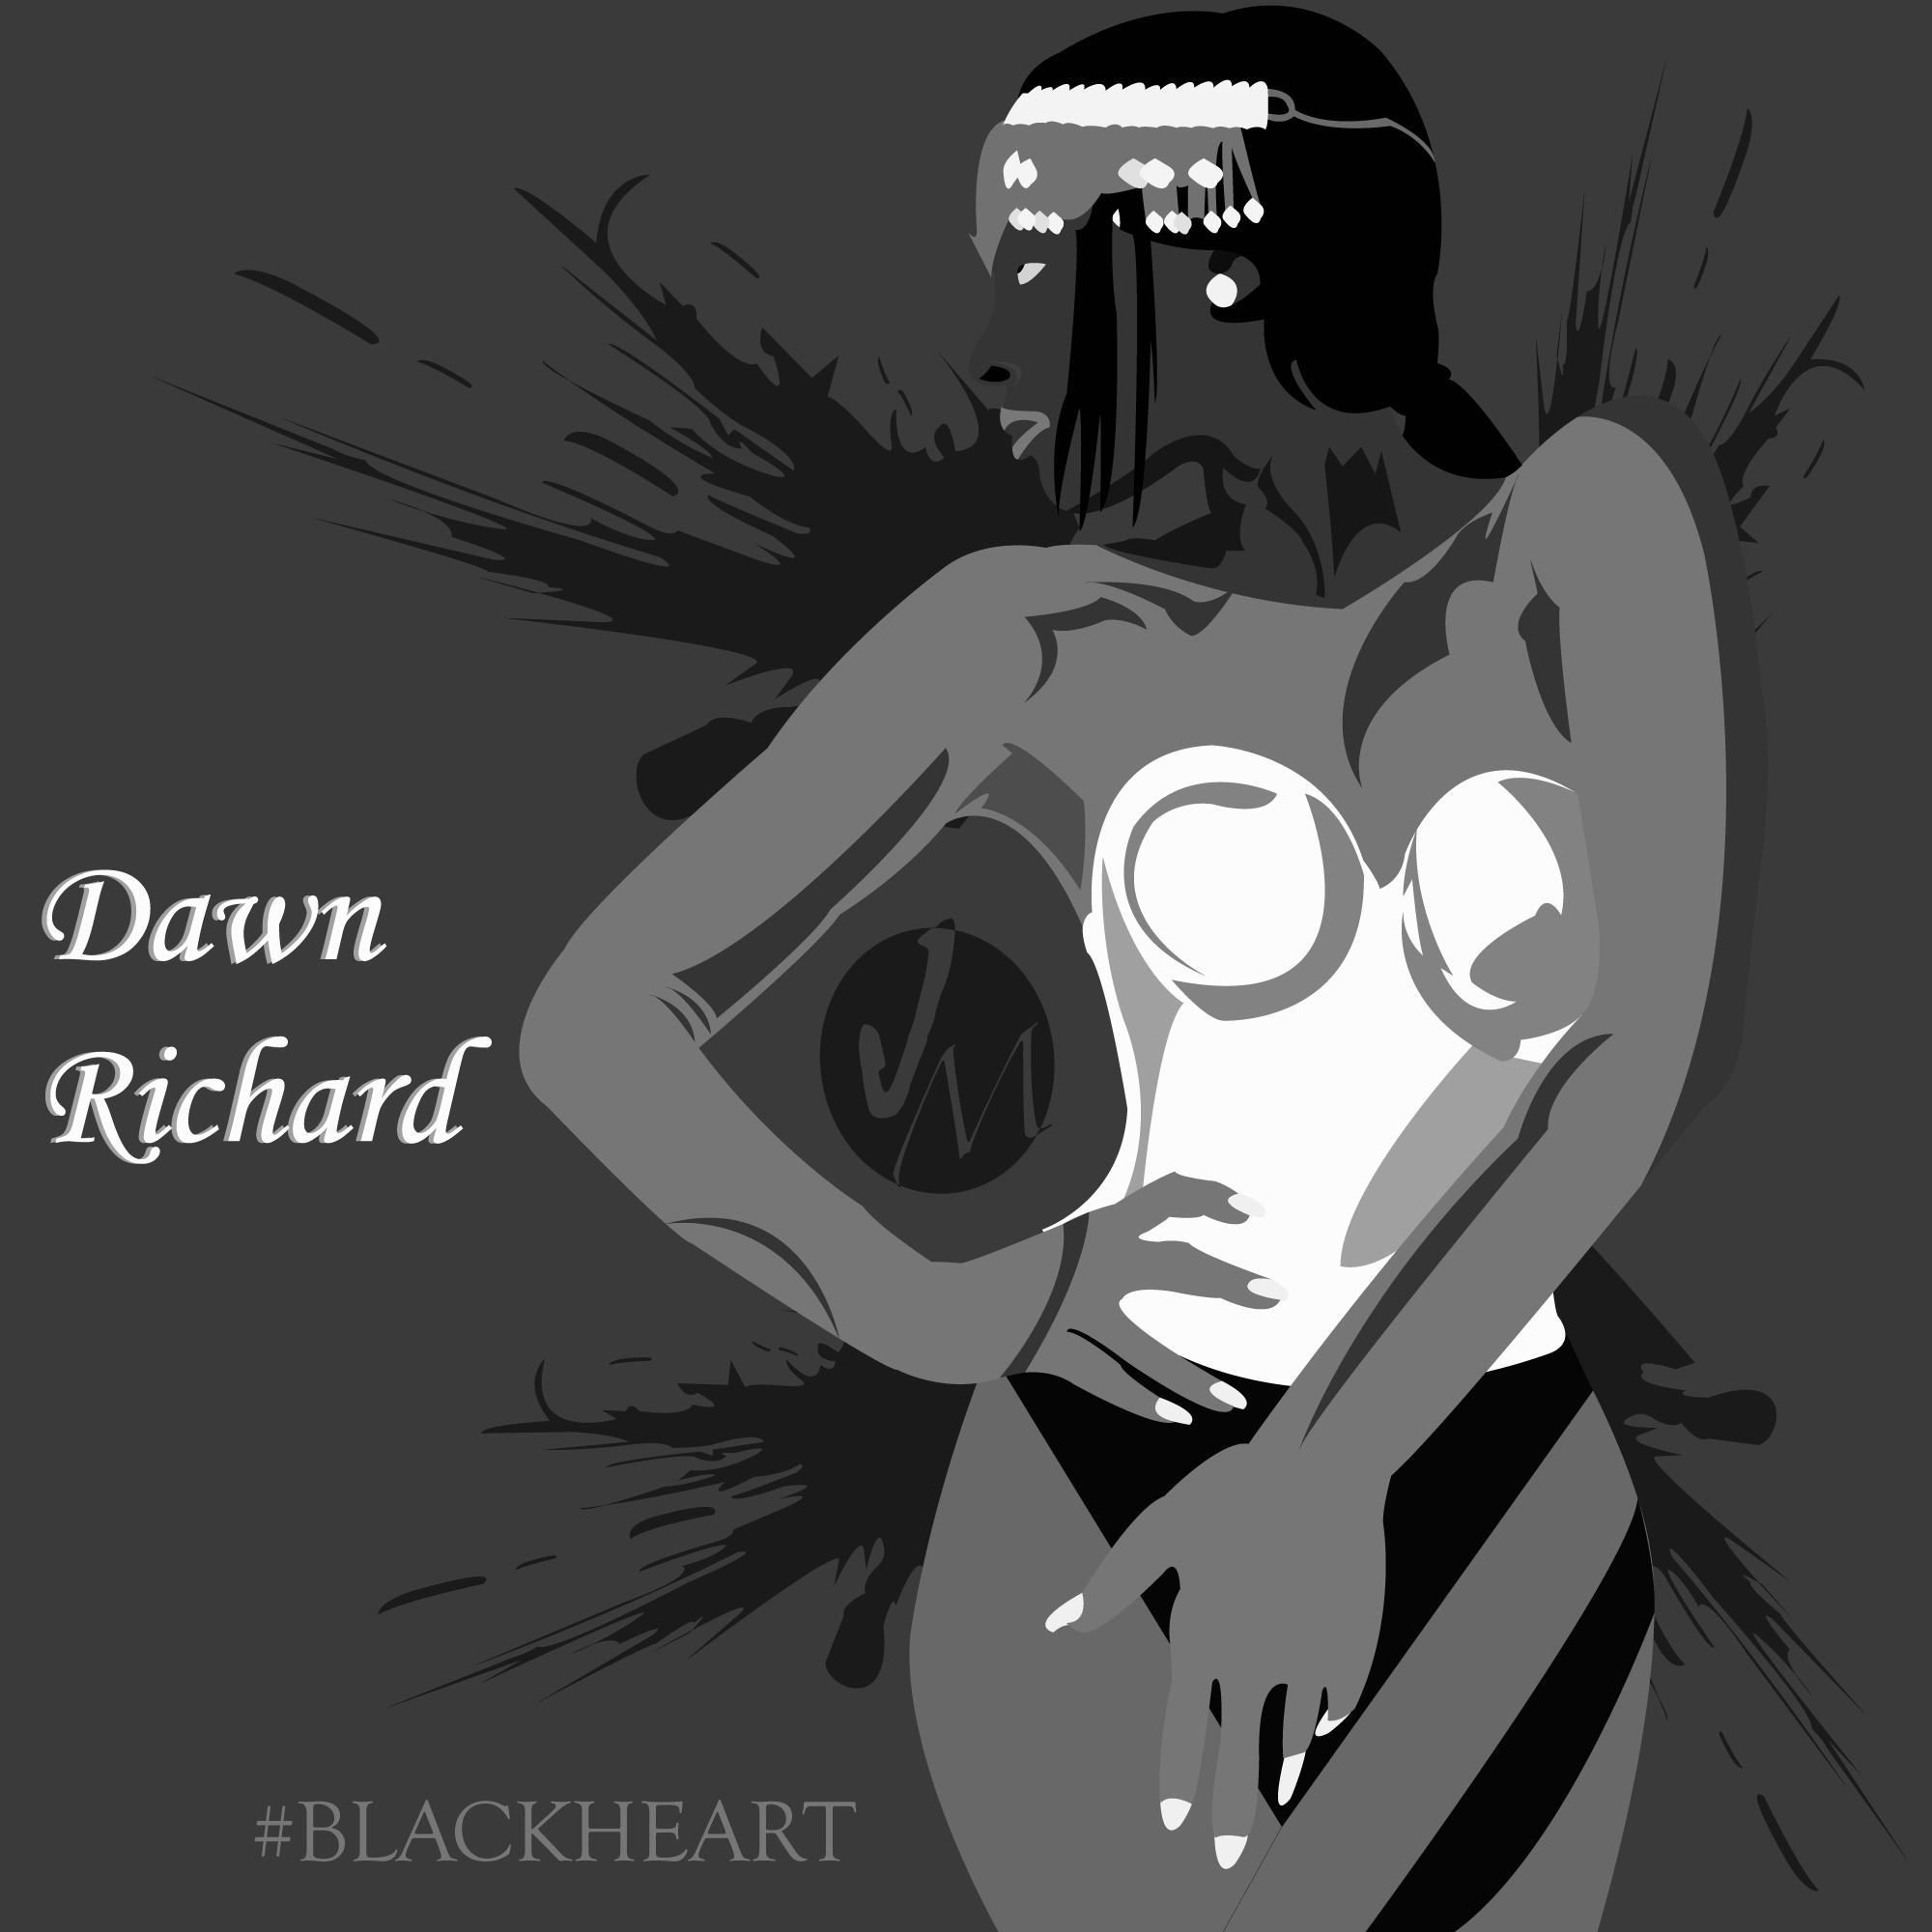 Dawn Richard Portrait [Blackheart]